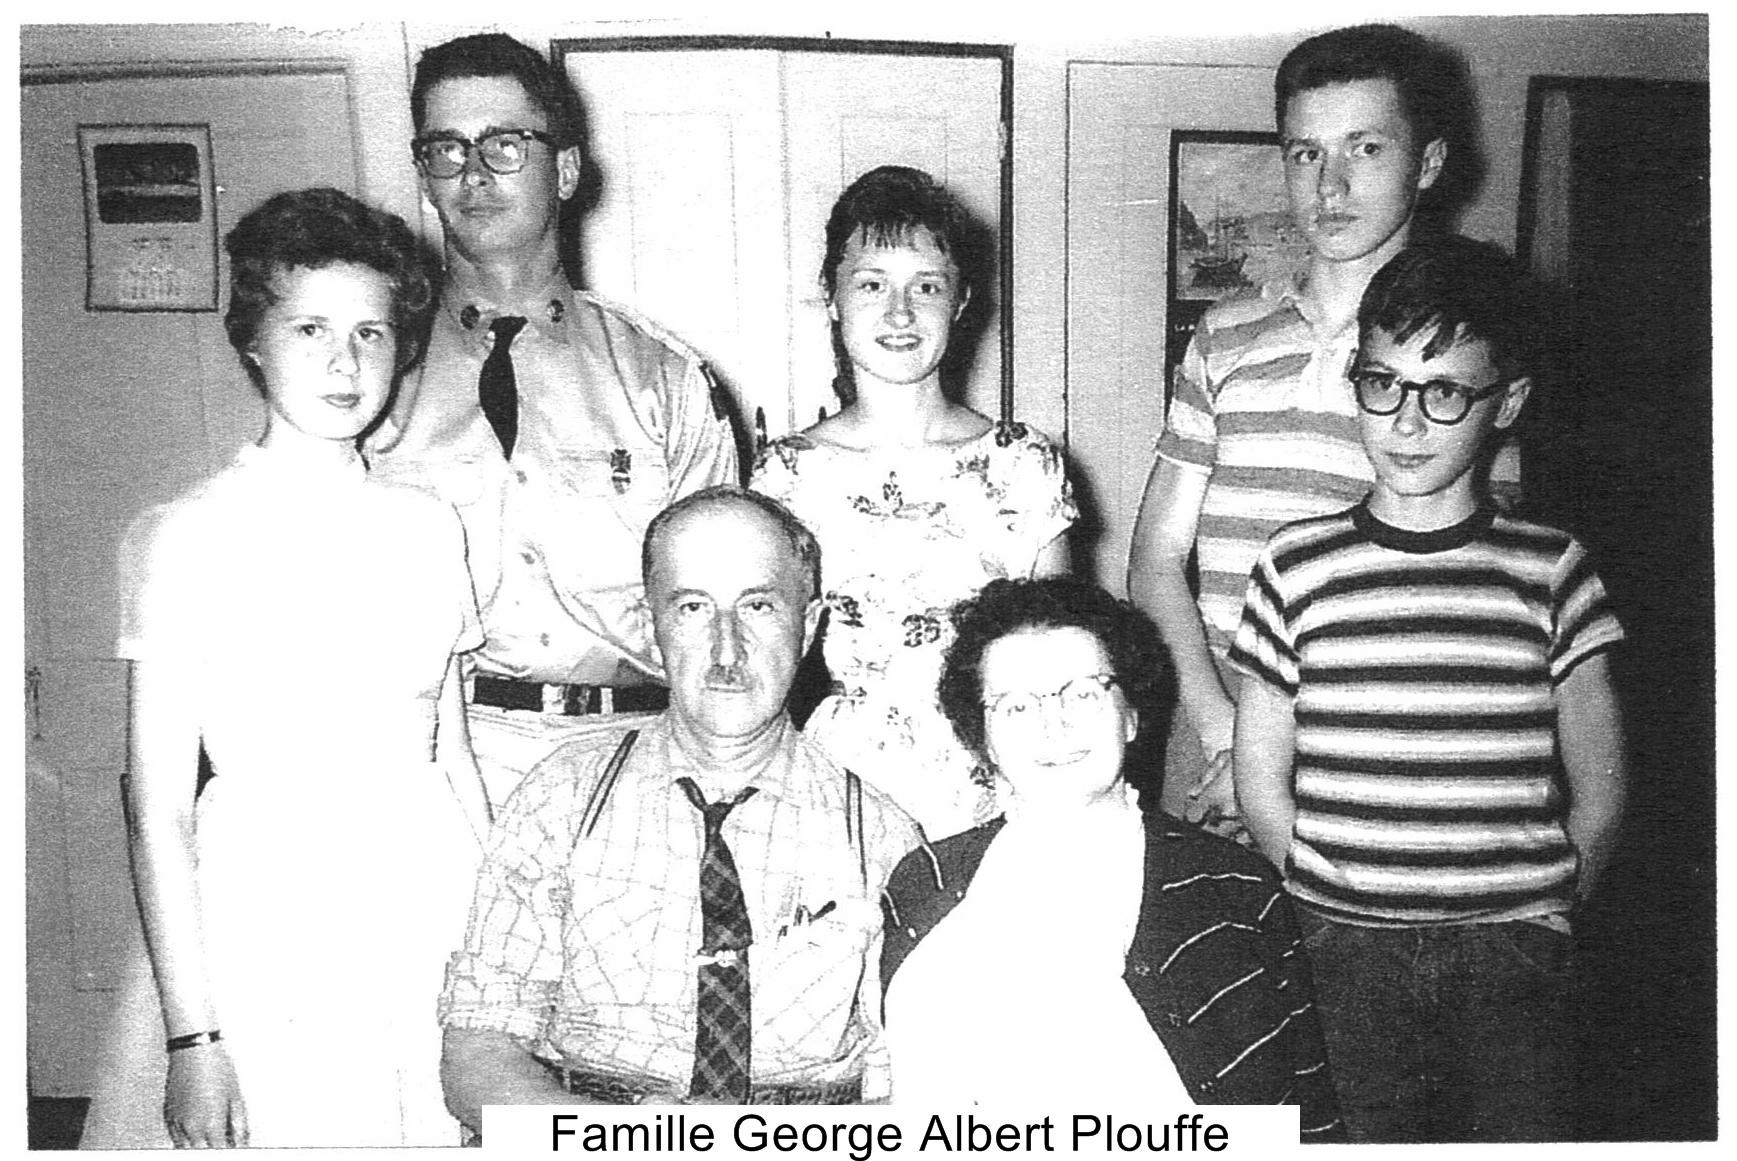 Famille George Albert Plouffe